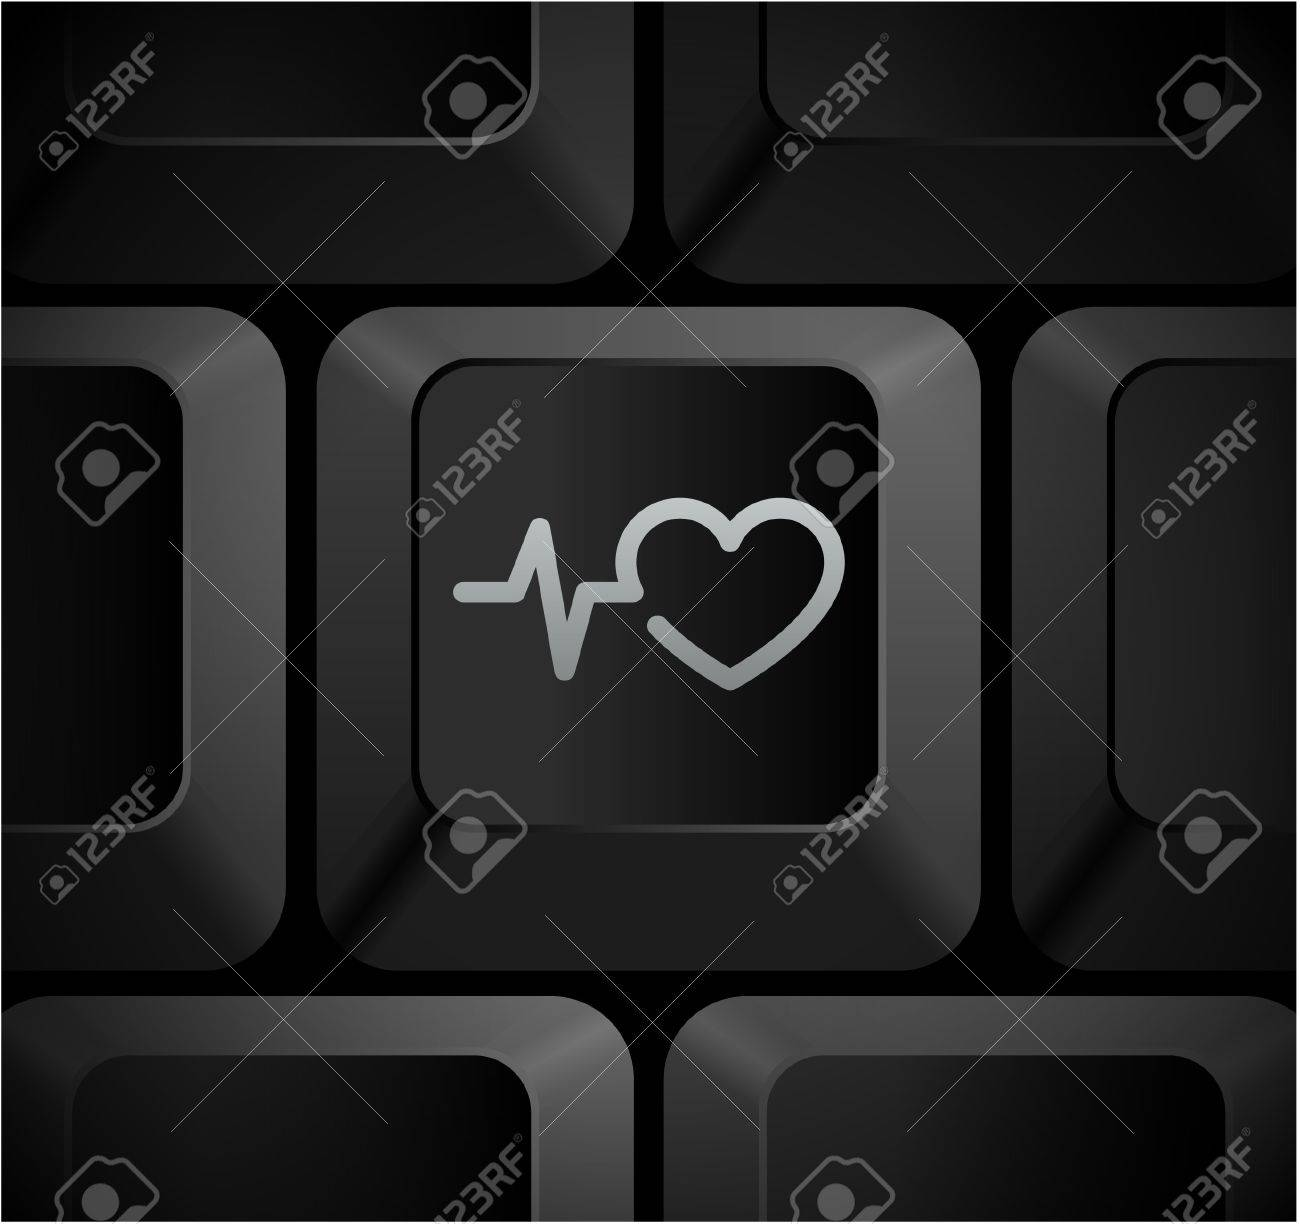 Pulse heart rate icon on computer keyboard original illustration pulse heart rate icon on computer keyboard original illustration stock illustration 7568203 buycottarizona Choice Image